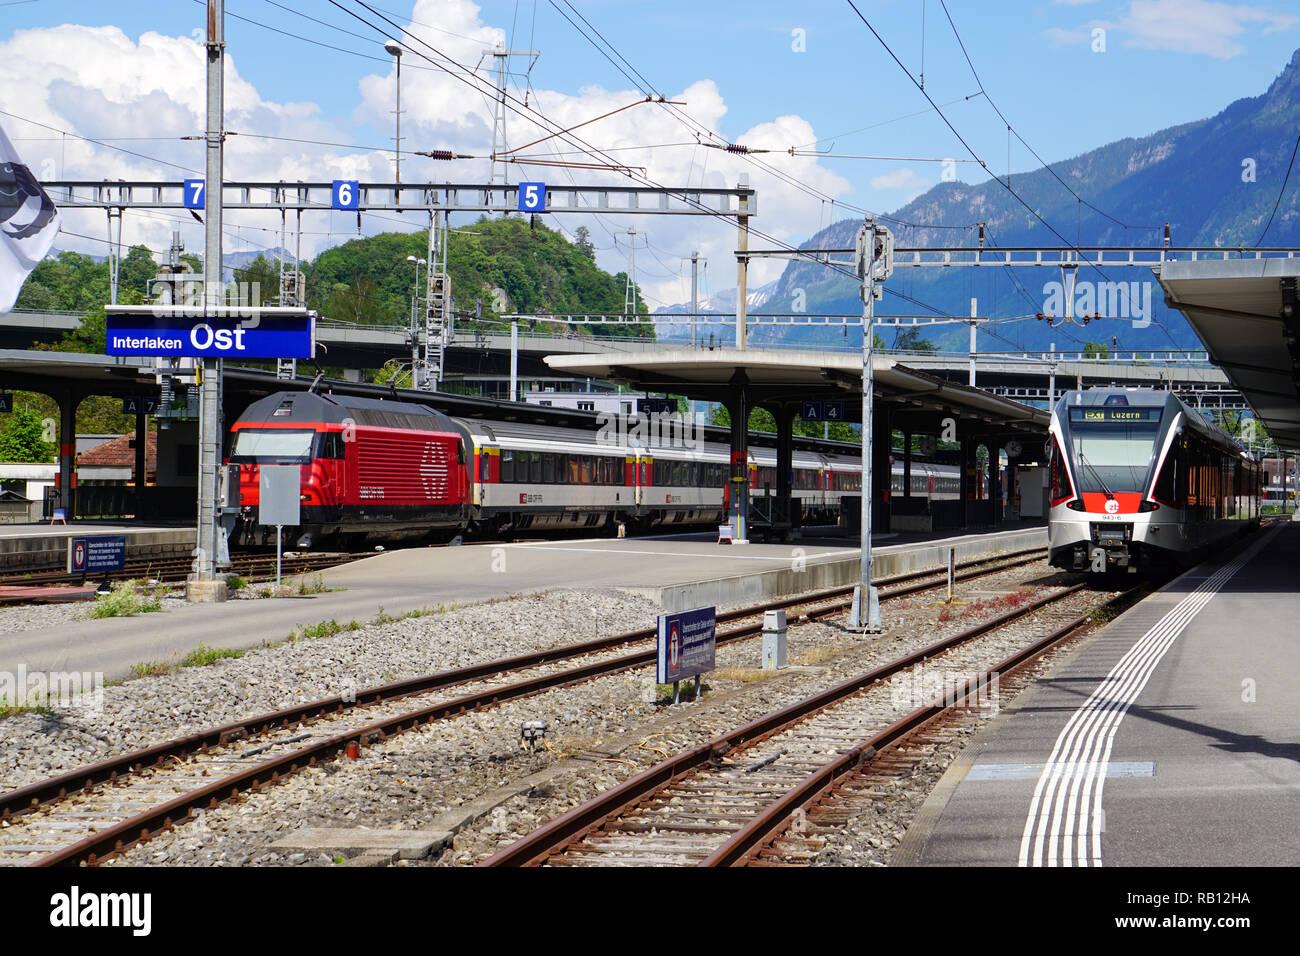 Trains at the Interlaken Ost railway station - Stock Image